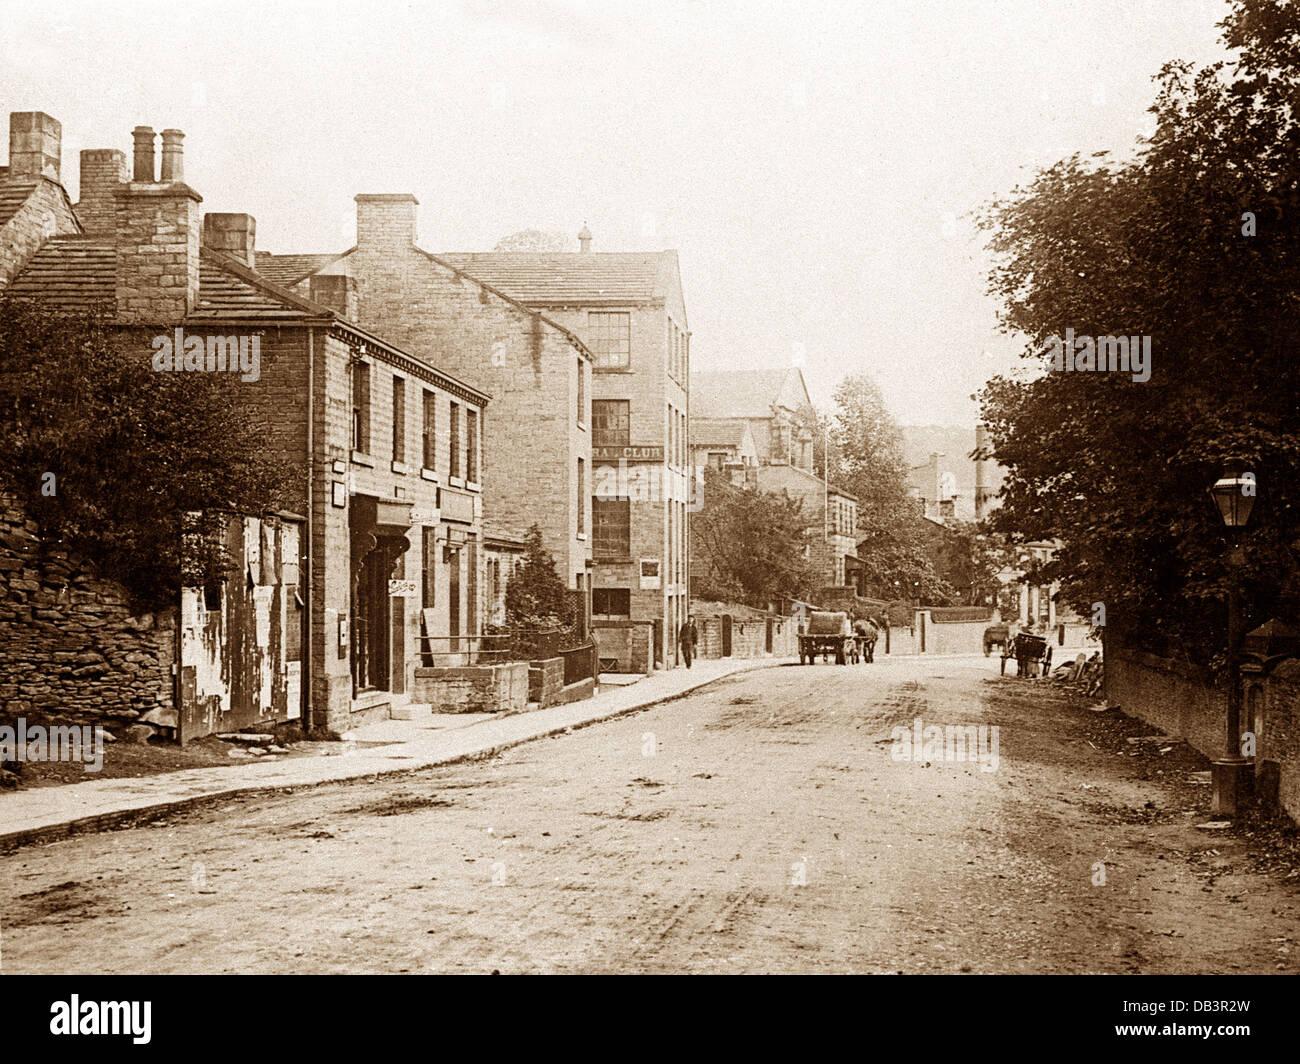 Kirkburton early 1900s - Stock Image